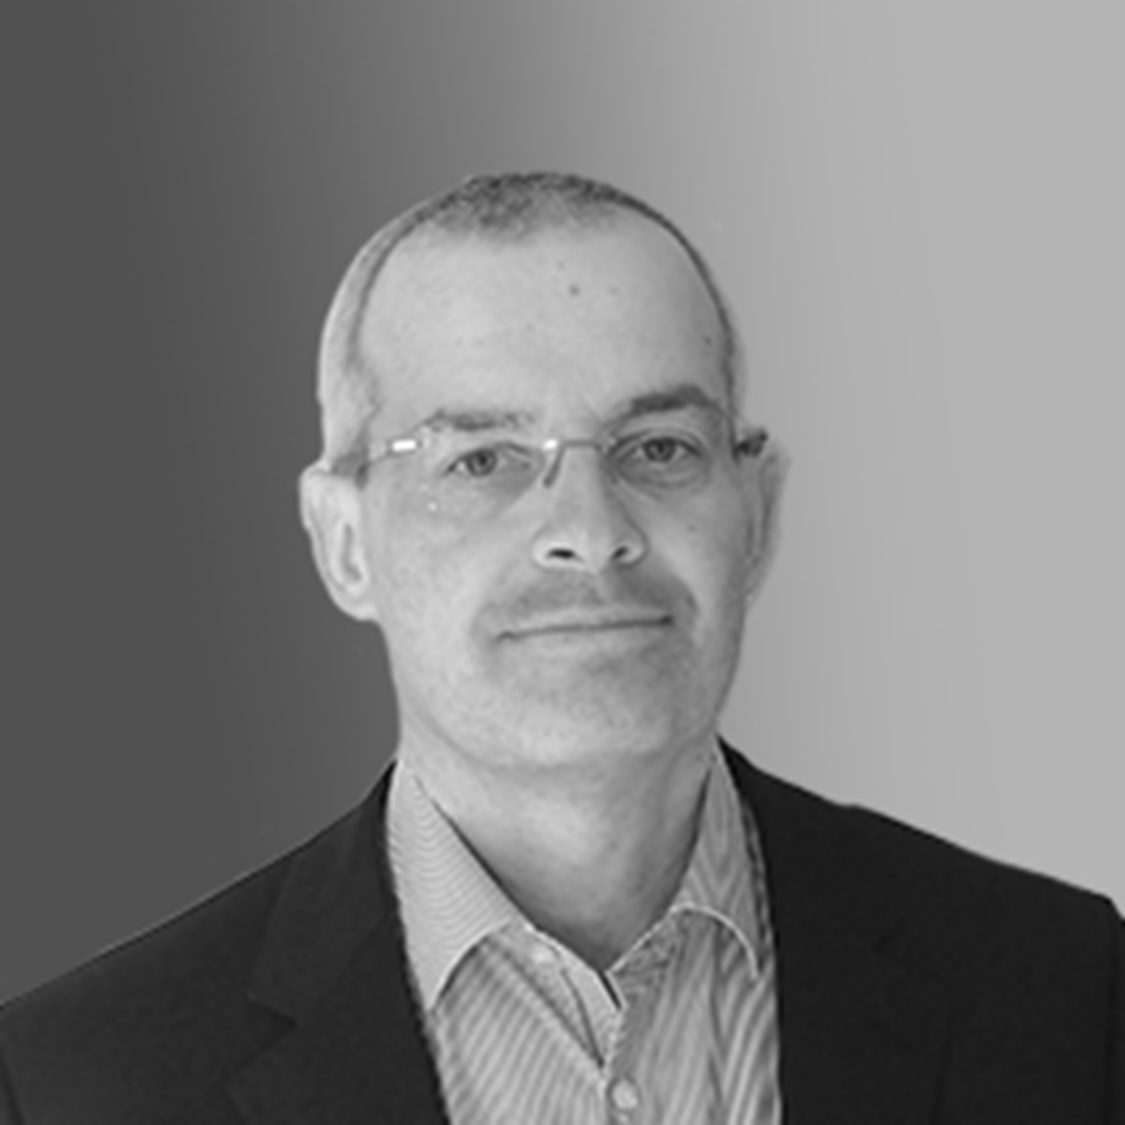 Ronald Kubelec